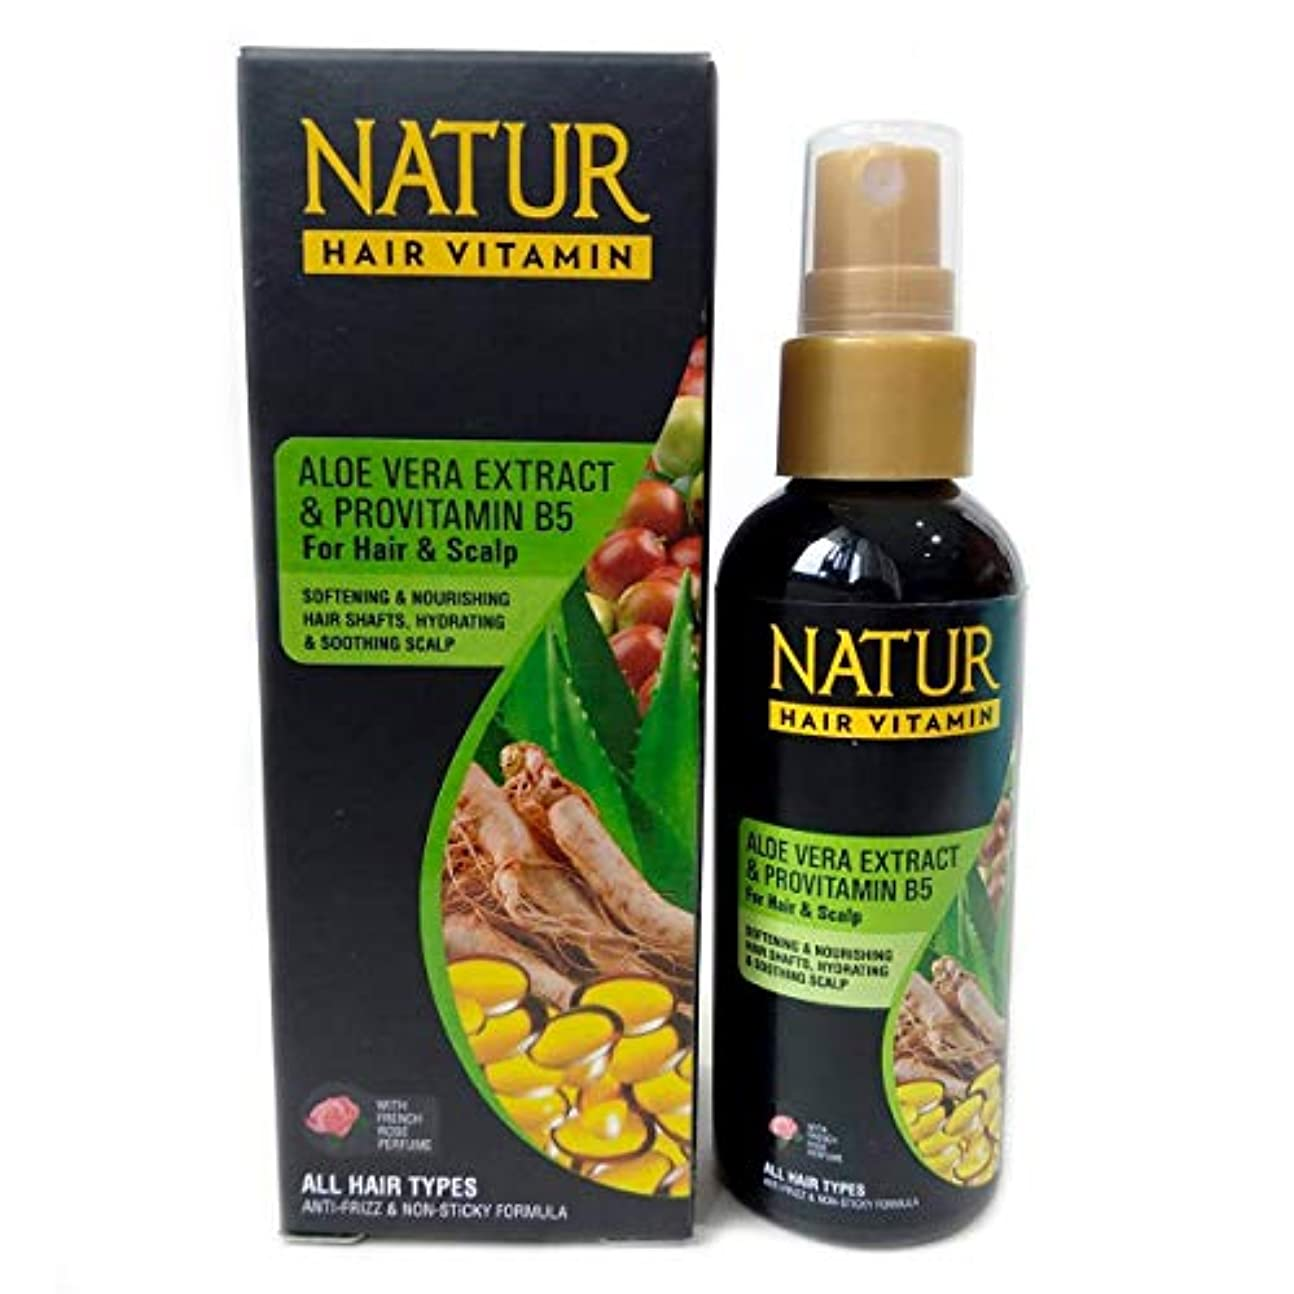 NATUR ナトゥール 天然植物エキス配合 Hair Vitamin ハーバルヘアビタミン 80ml Aloe vera&Provitamin B5 アロエベラ&プロビタミンB5 [海外直商品]